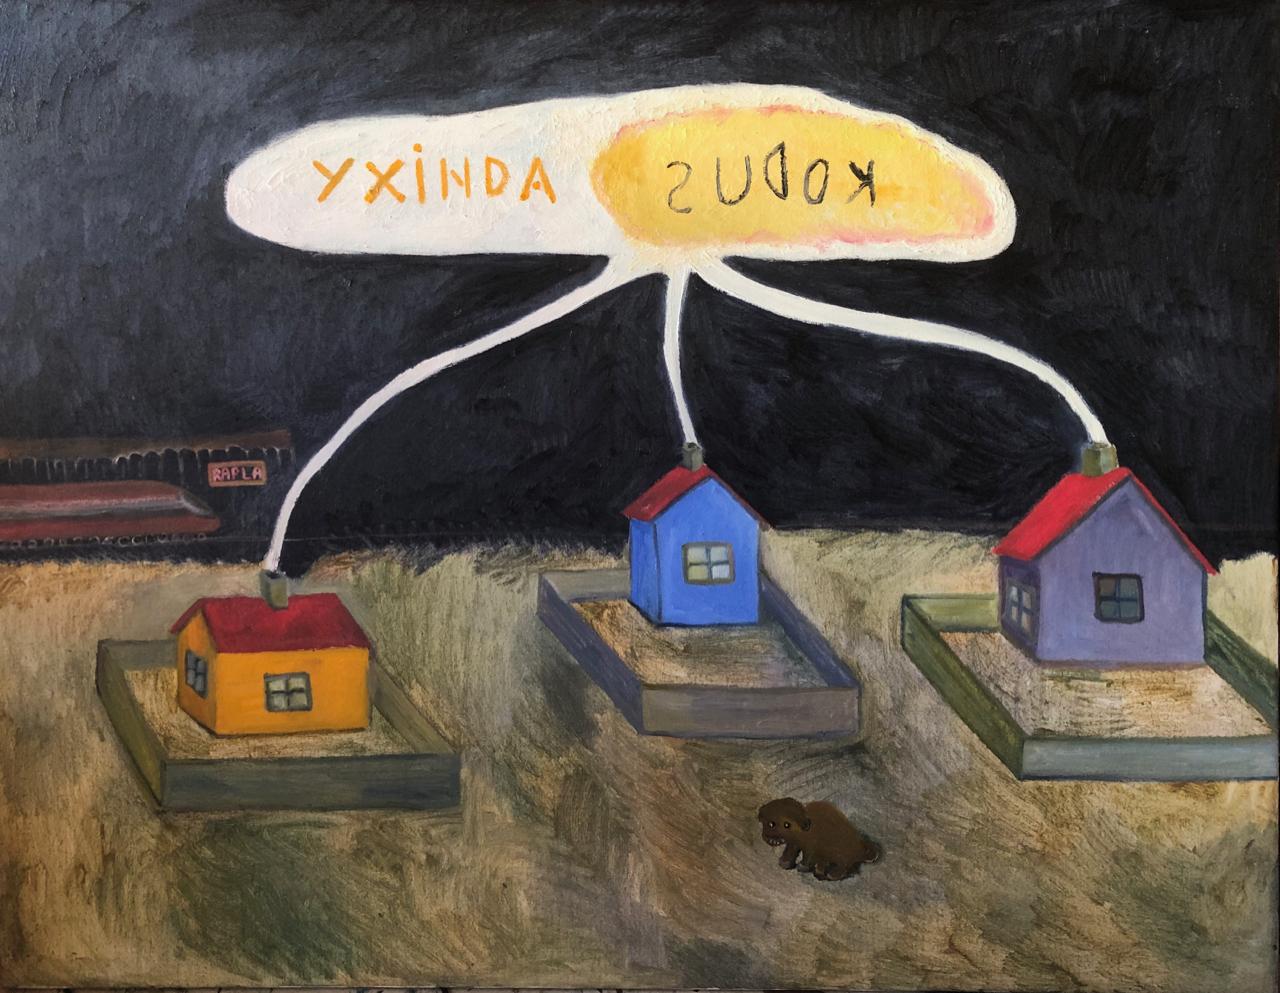 Yxinda kodus